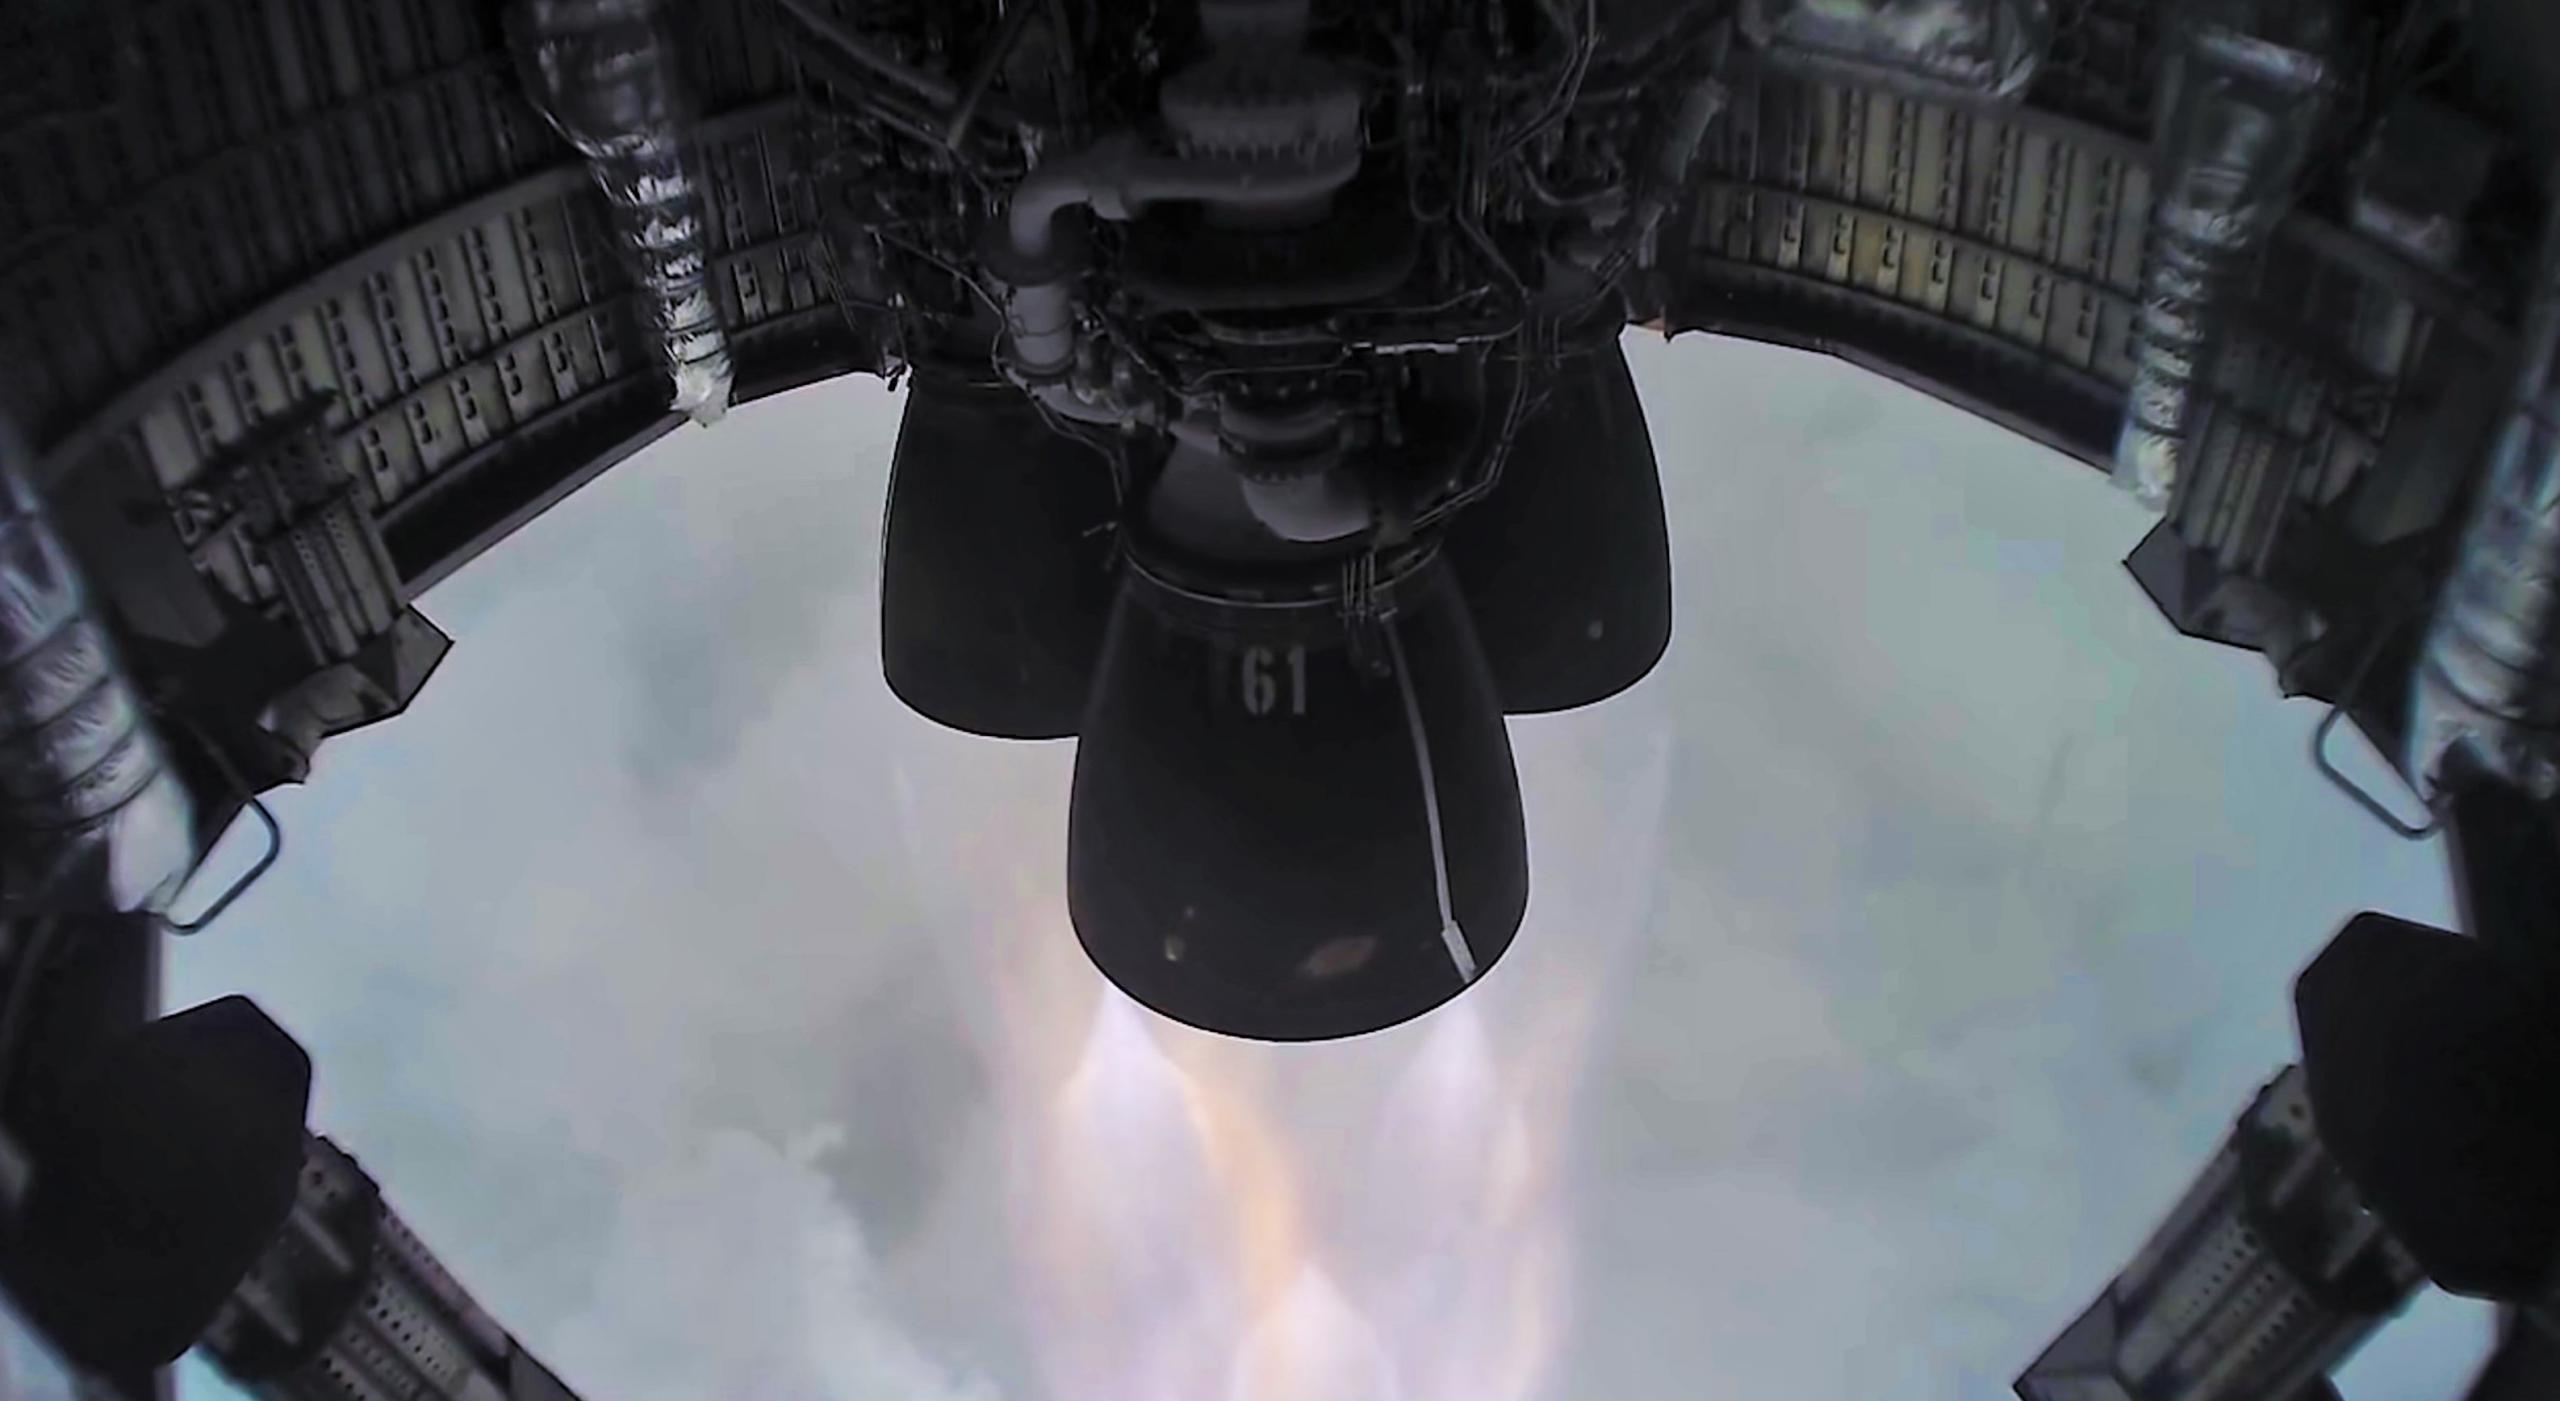 Starship SN15 10km flight test 050521 recap (SpaceX) ascent 1 edit (c)